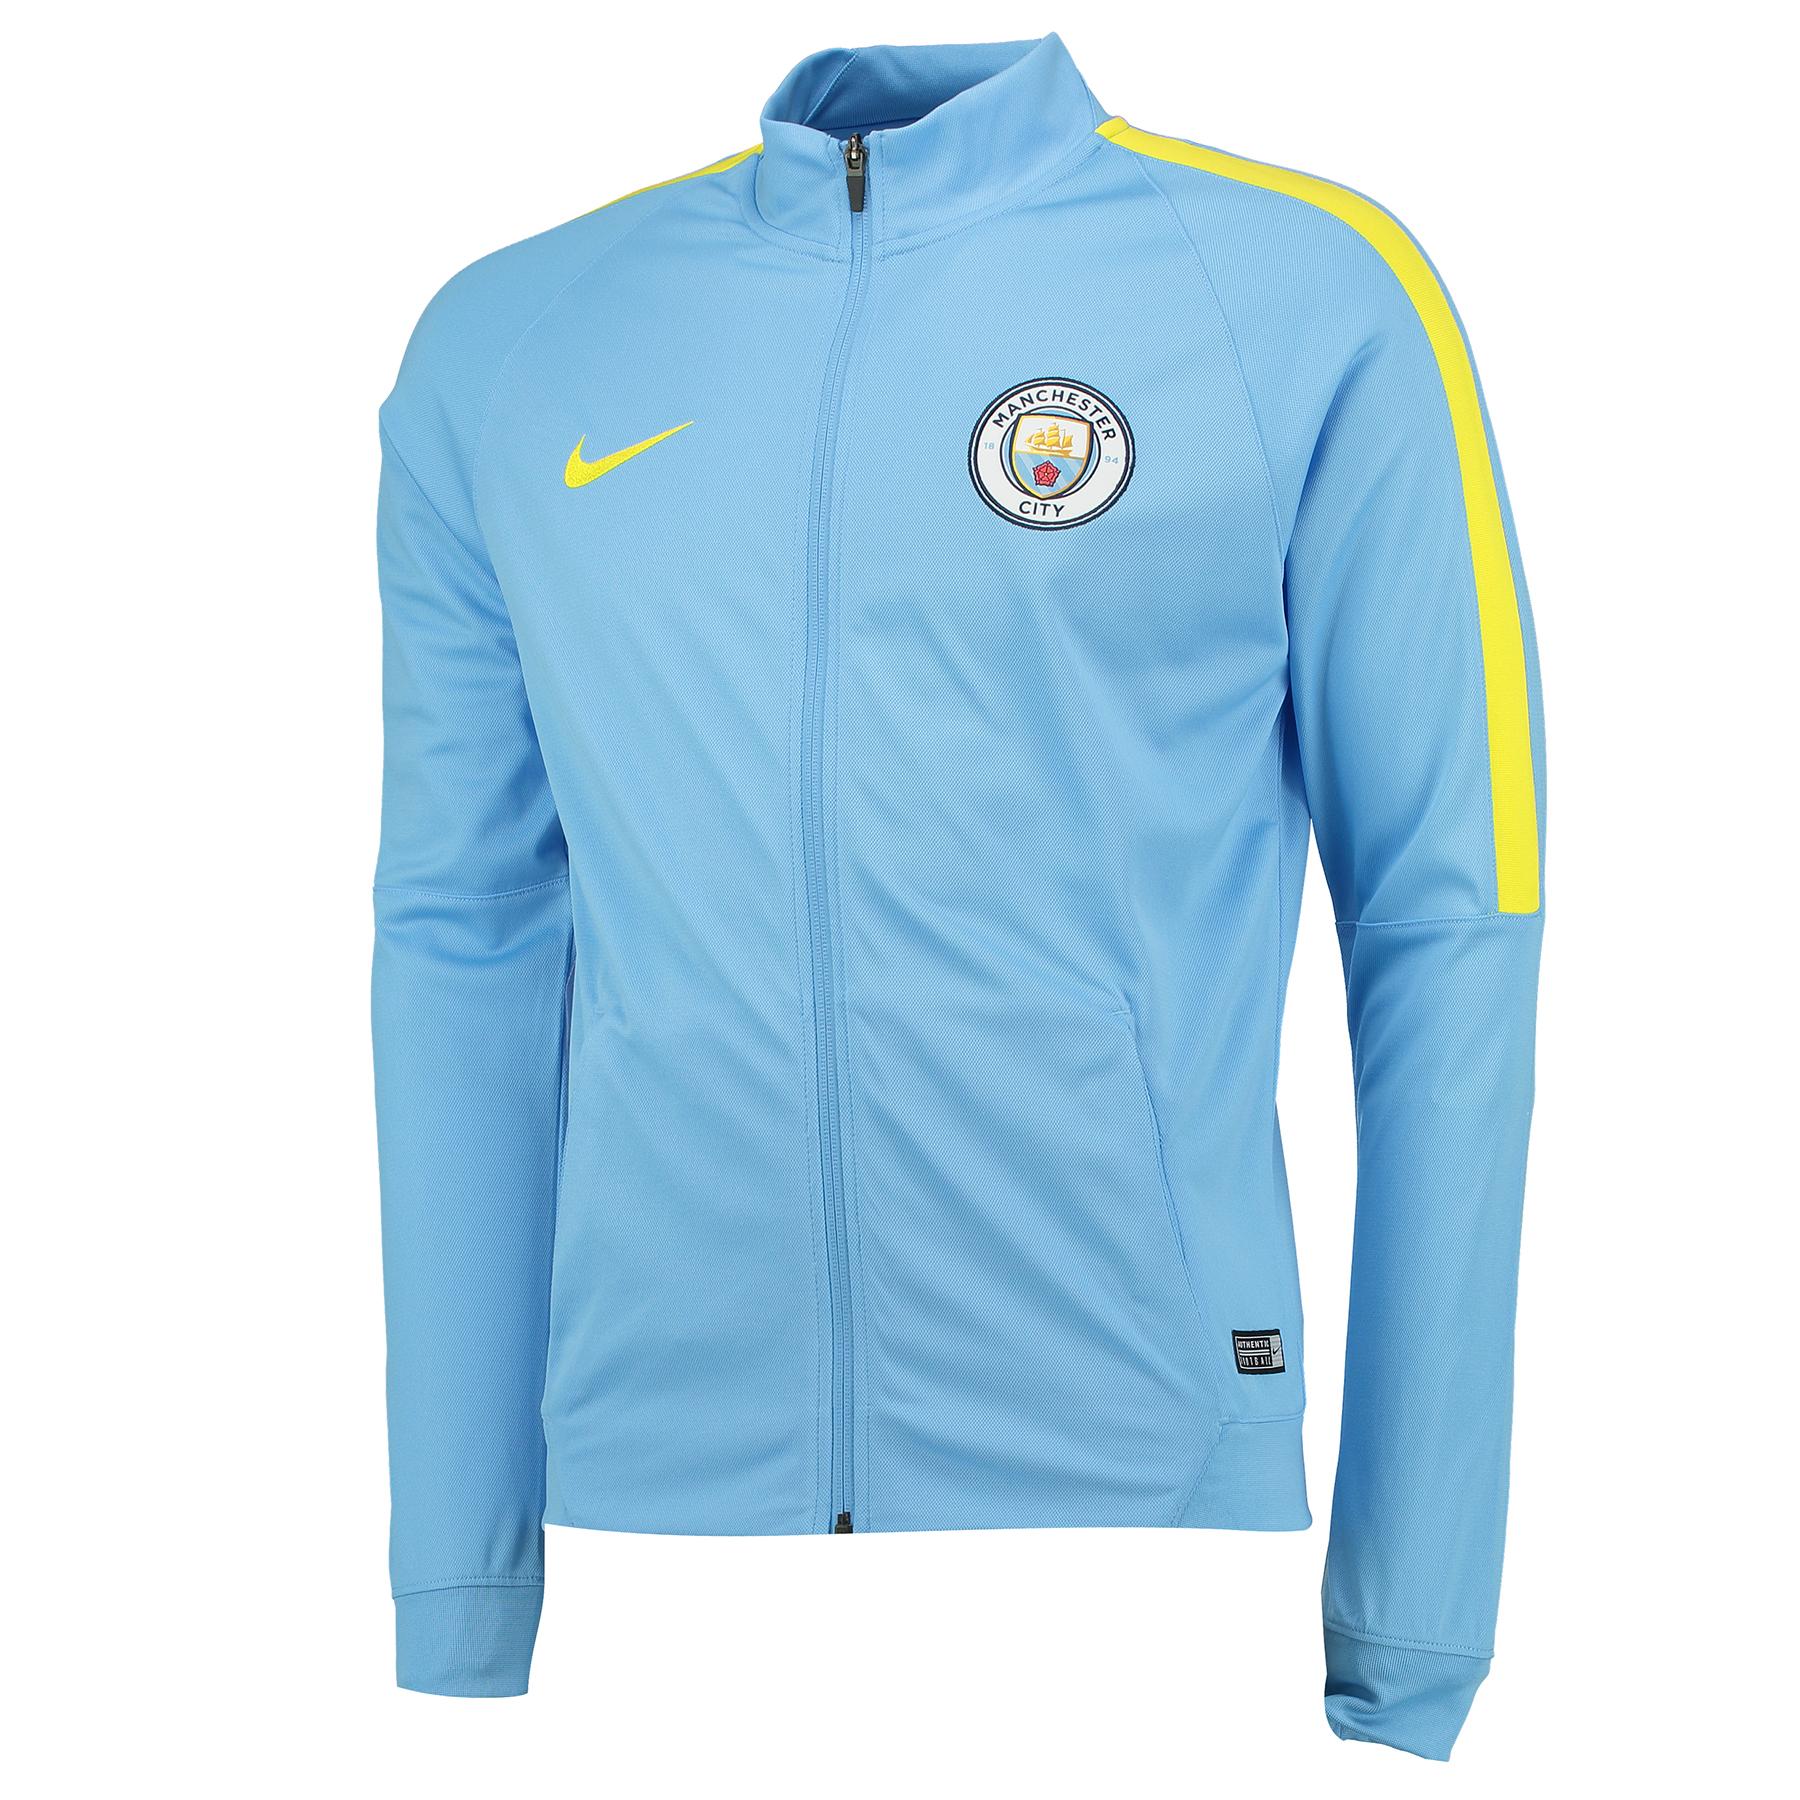 Manchester City Squad Track Top - Light Blue